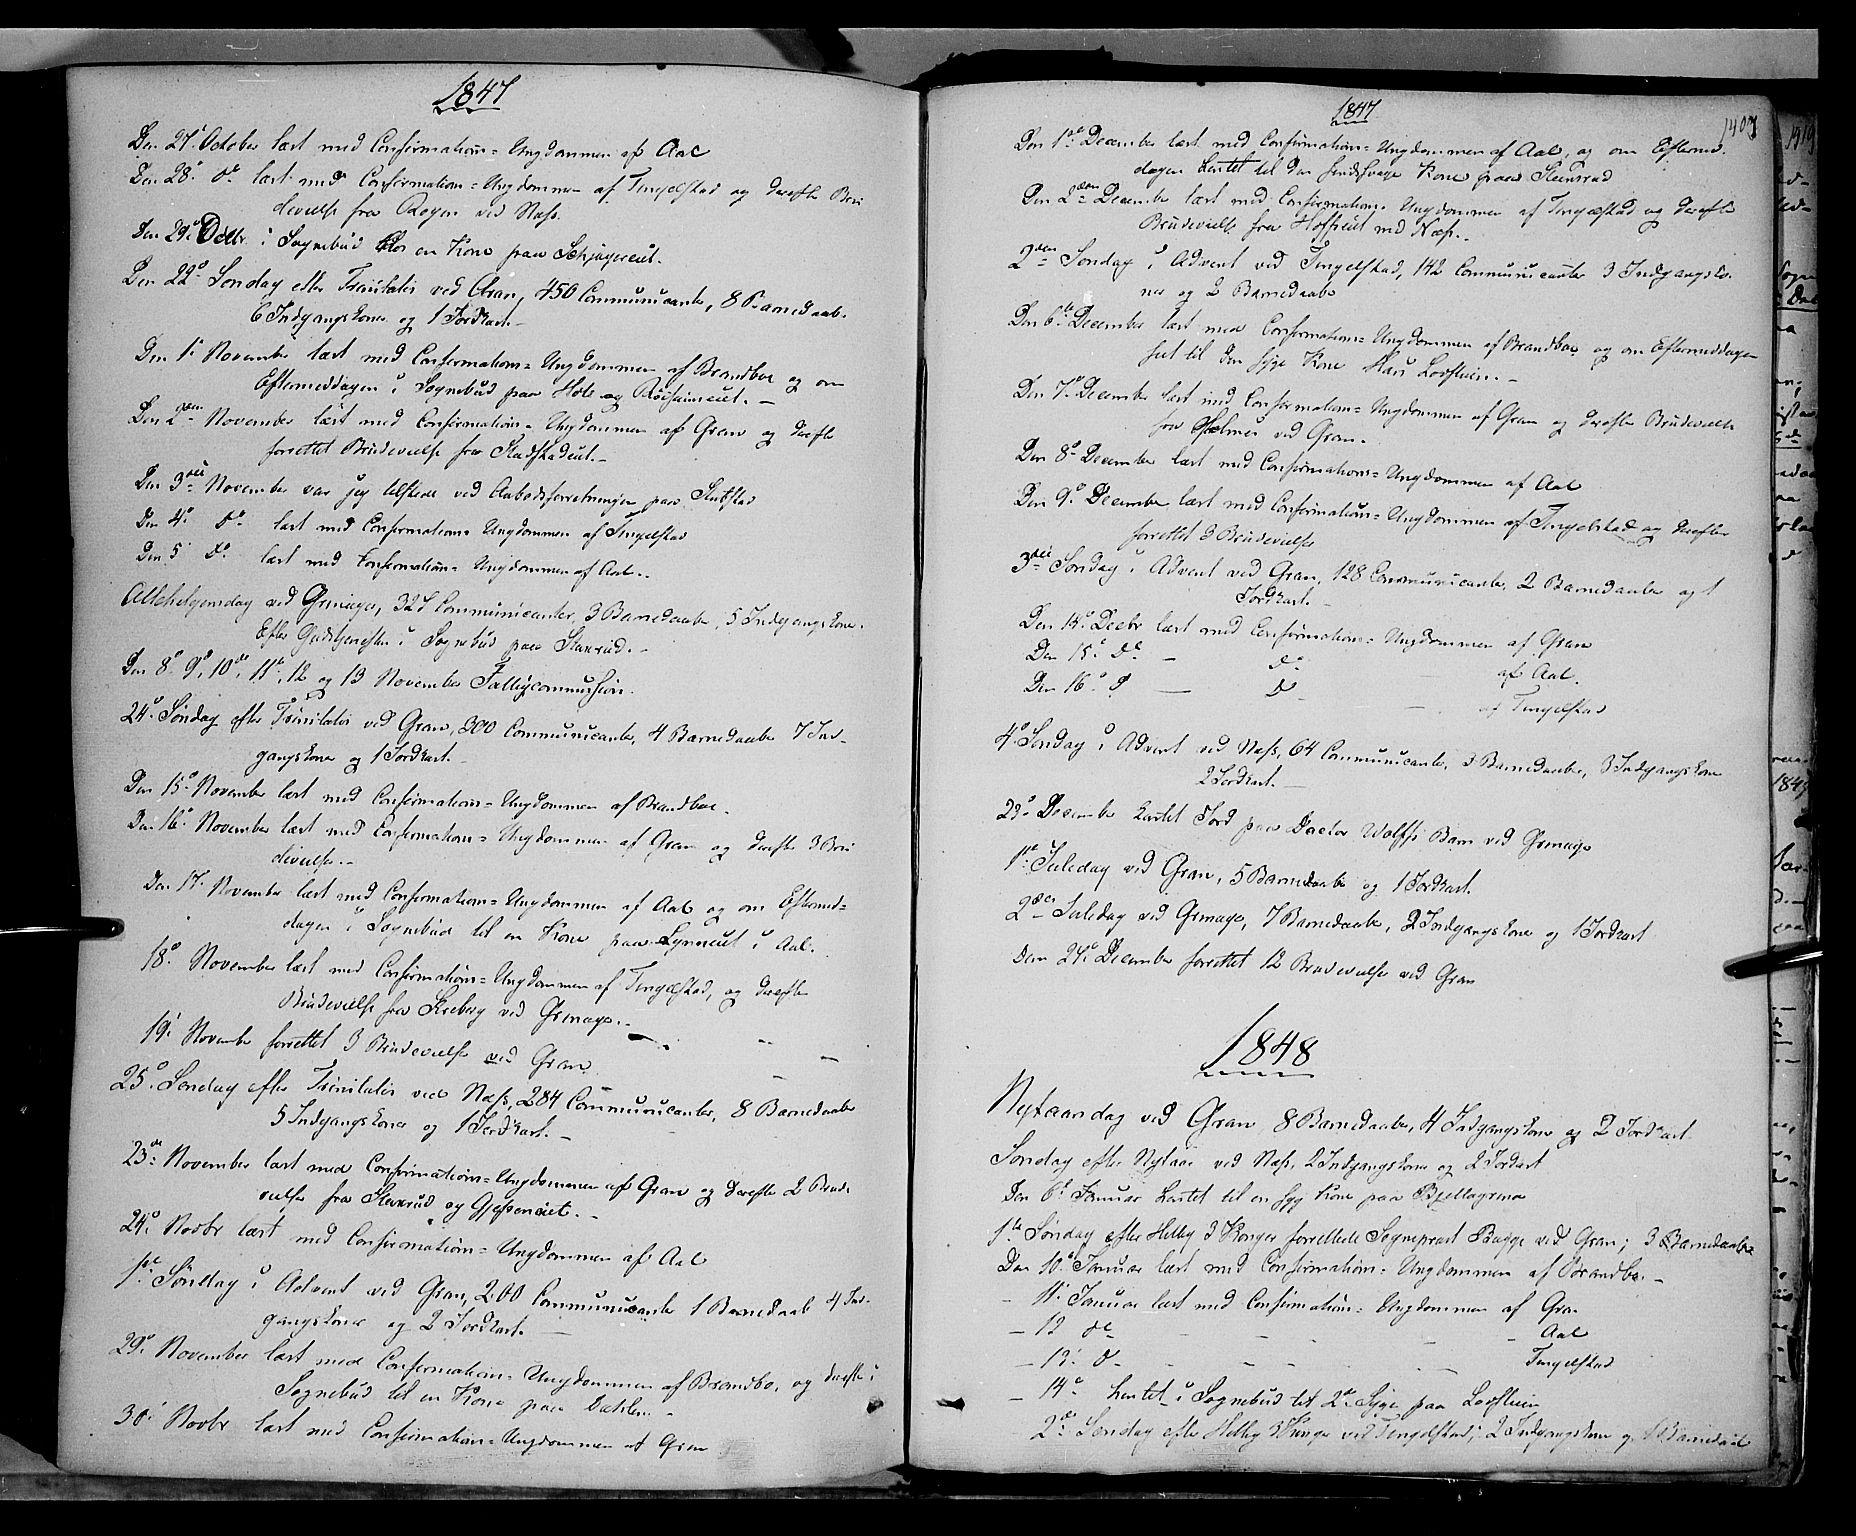 SAH, Gran prestekontor, Ministerialbok nr. 11, 1842-1856, s. 1406-1407